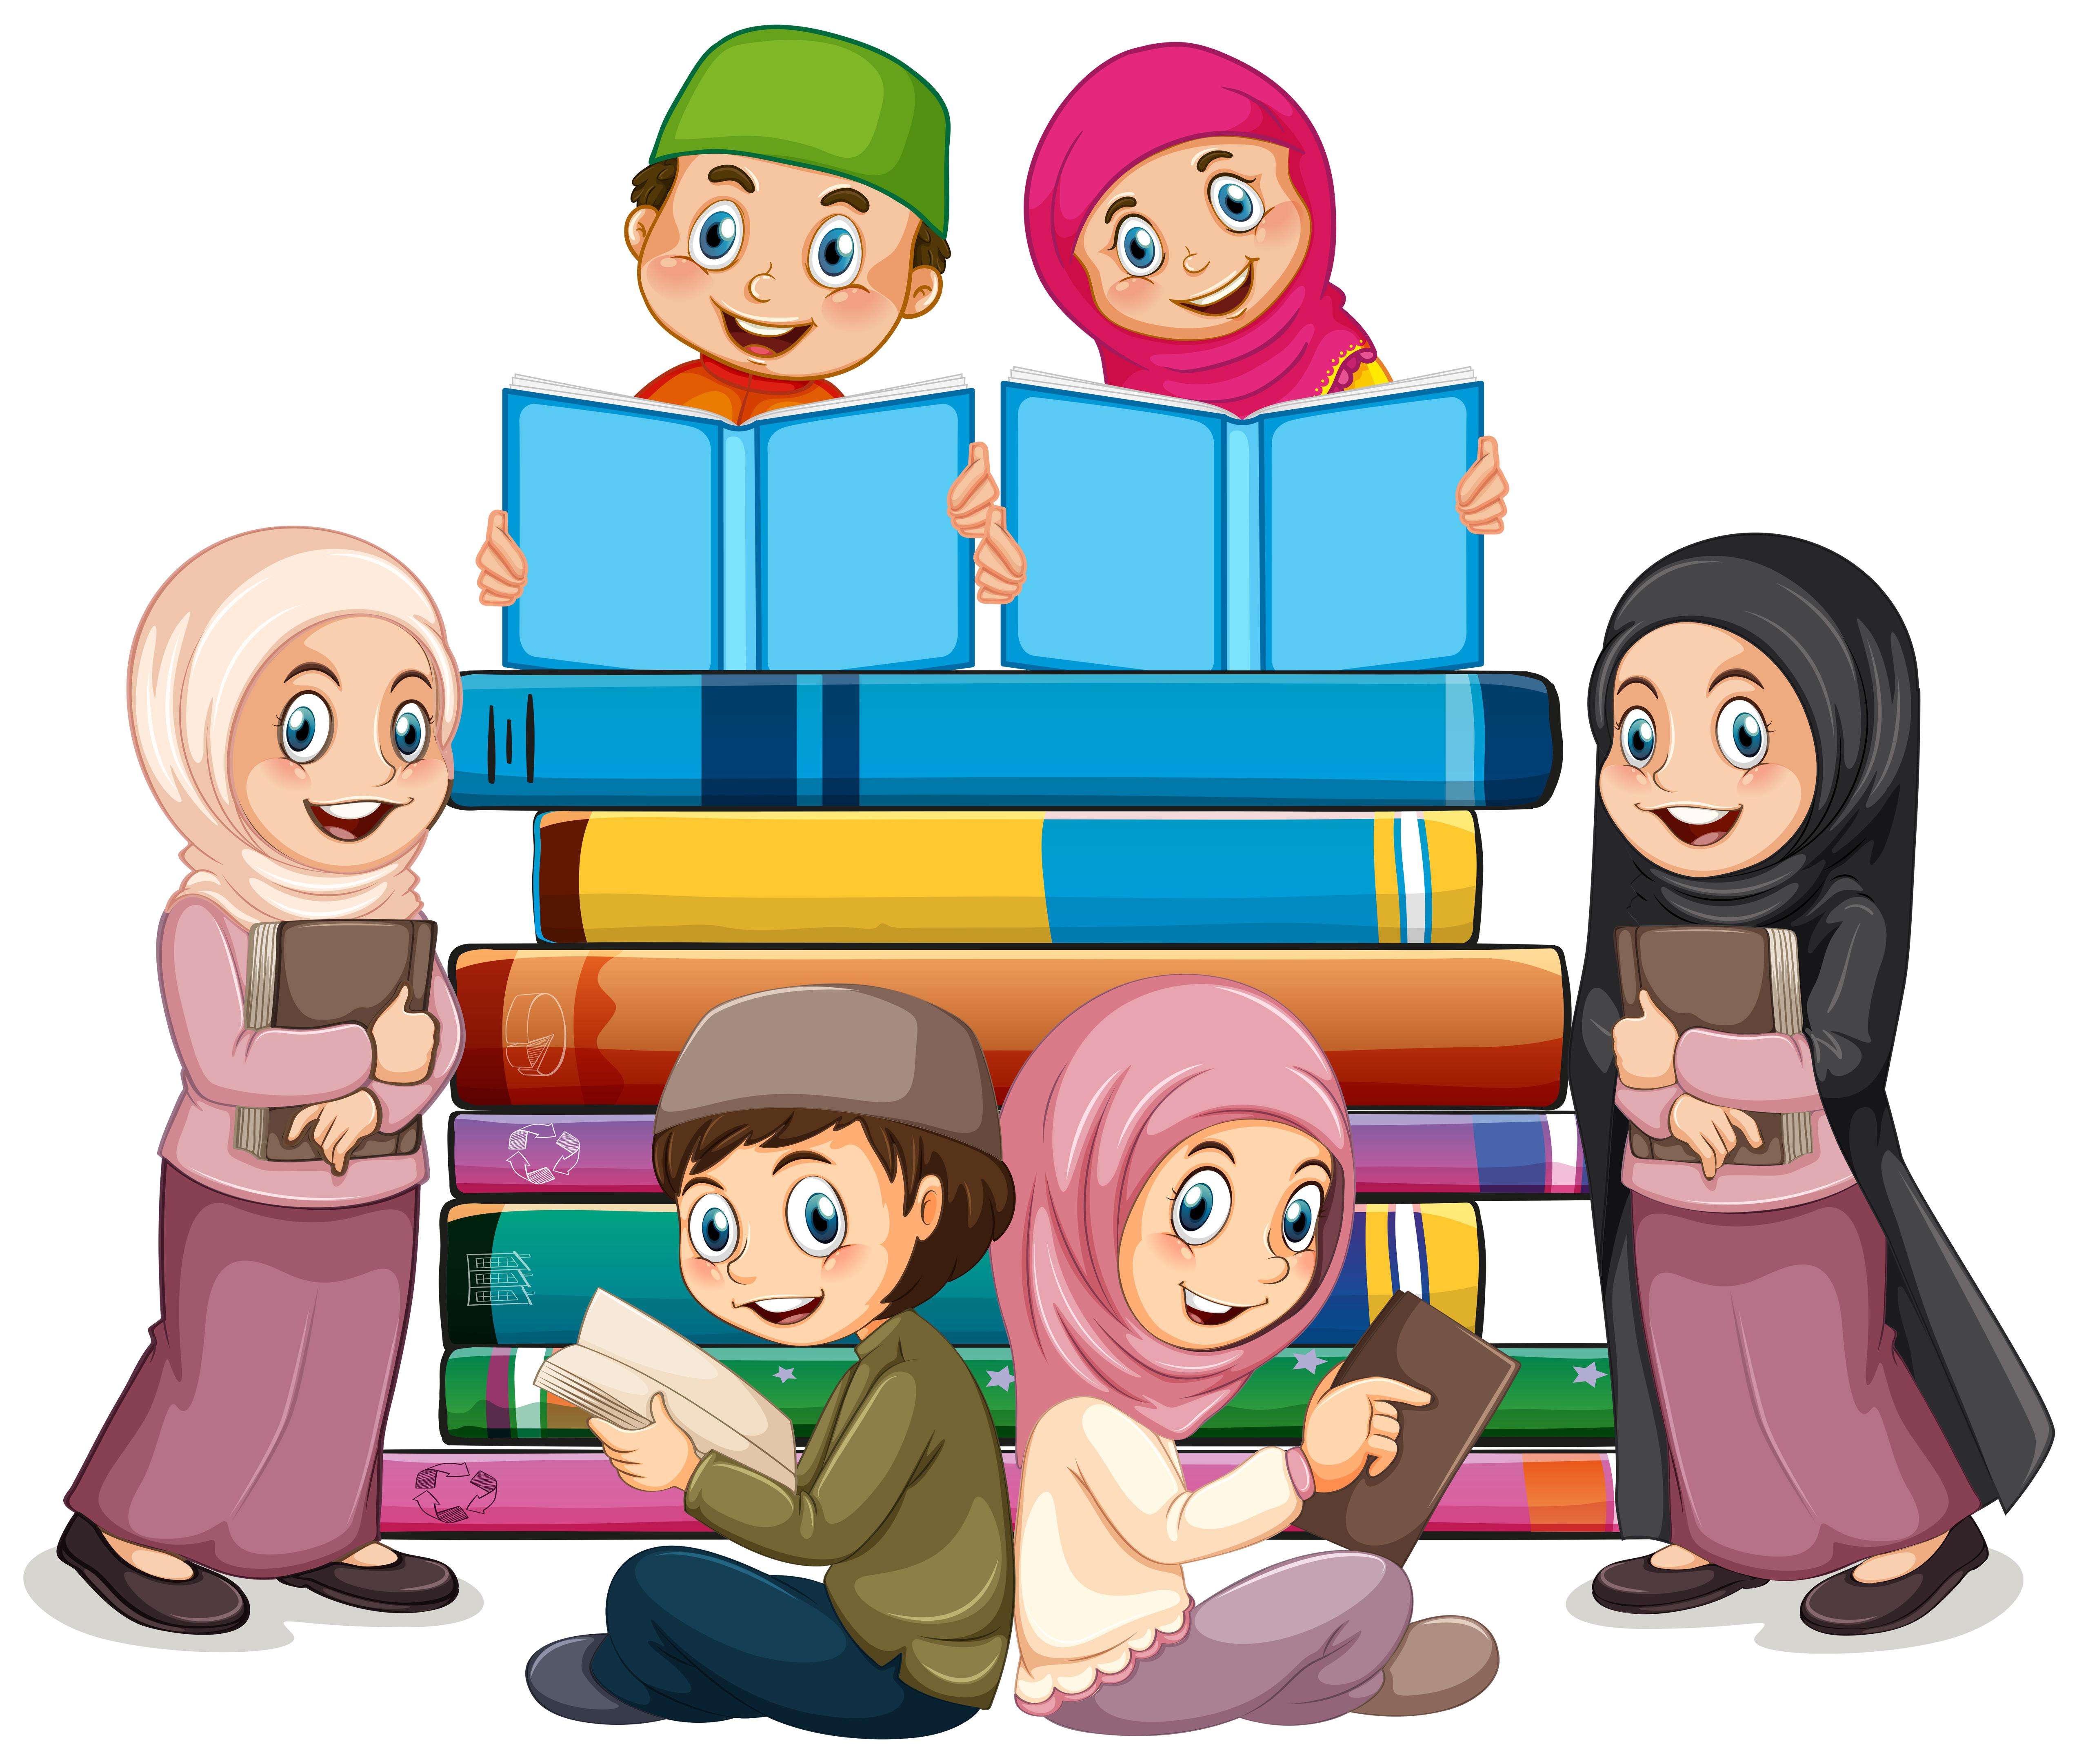 Two children reading books in school - Download Free Vectors, Clipart  Graphics & Vector Art